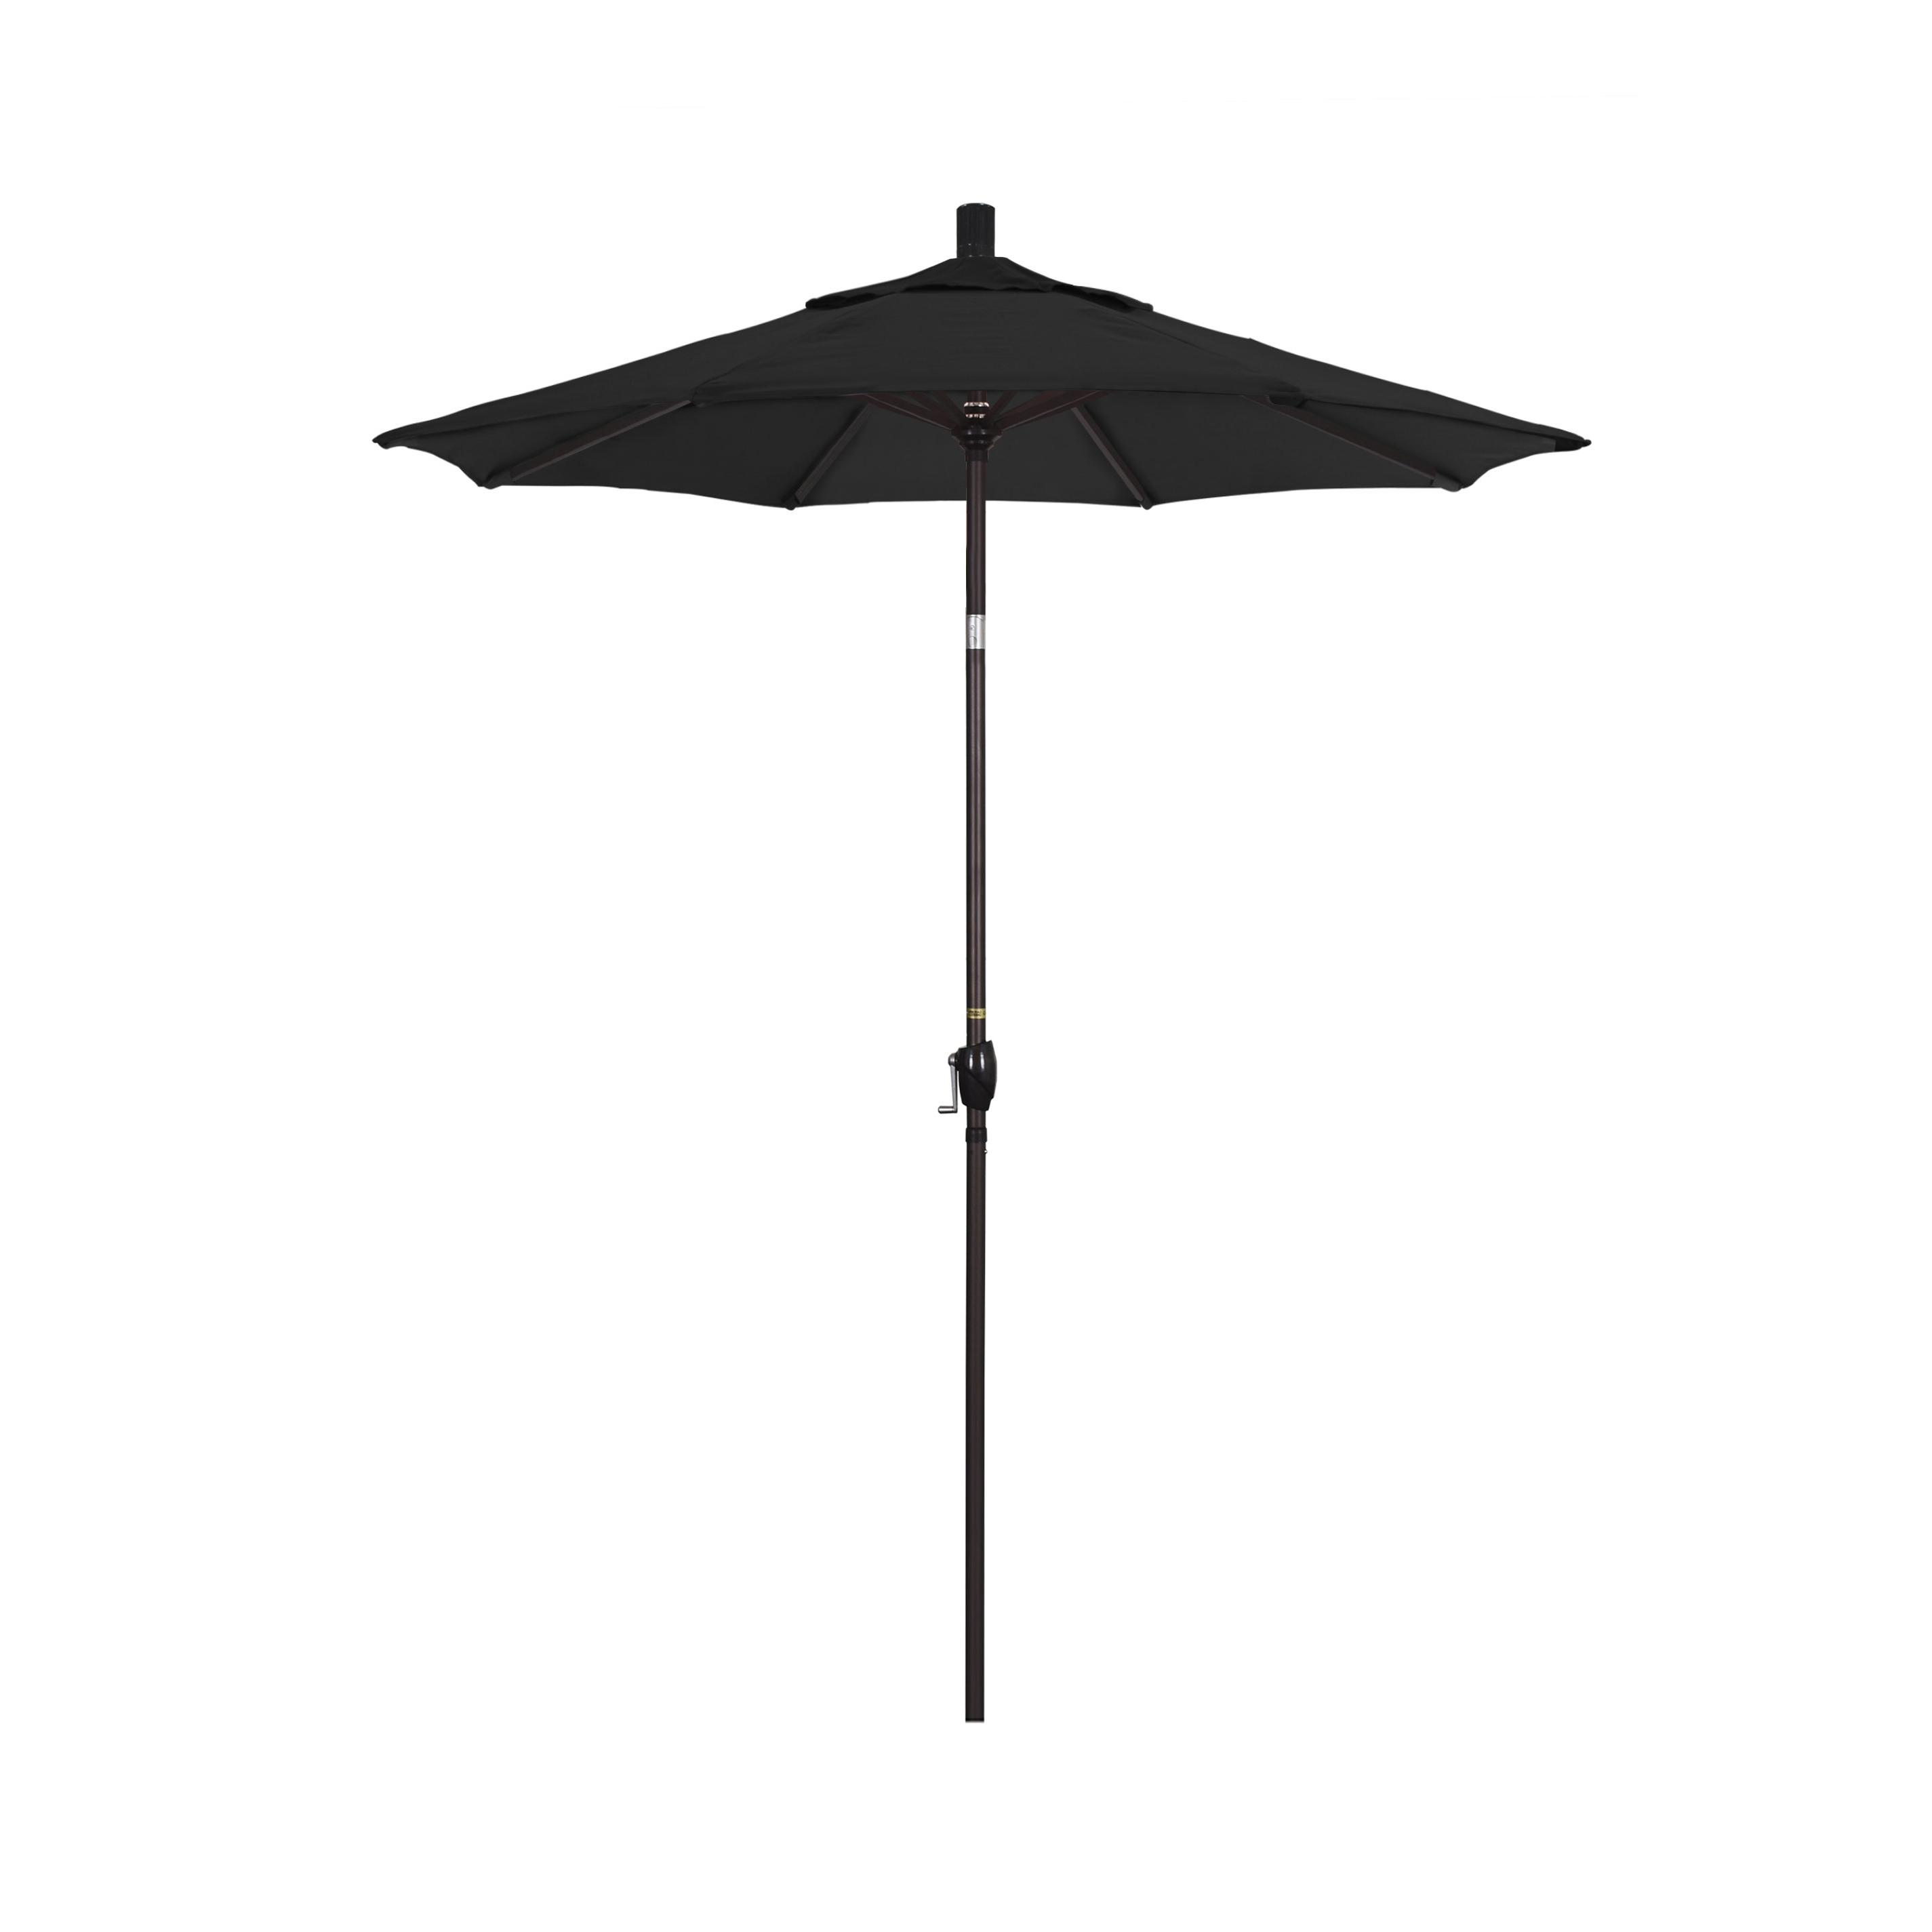 Popular Caravelle Square Market Sunbrella Umbrellas Within Wallach 6' Market Sunbrella Umbrella (View 14 of 20)